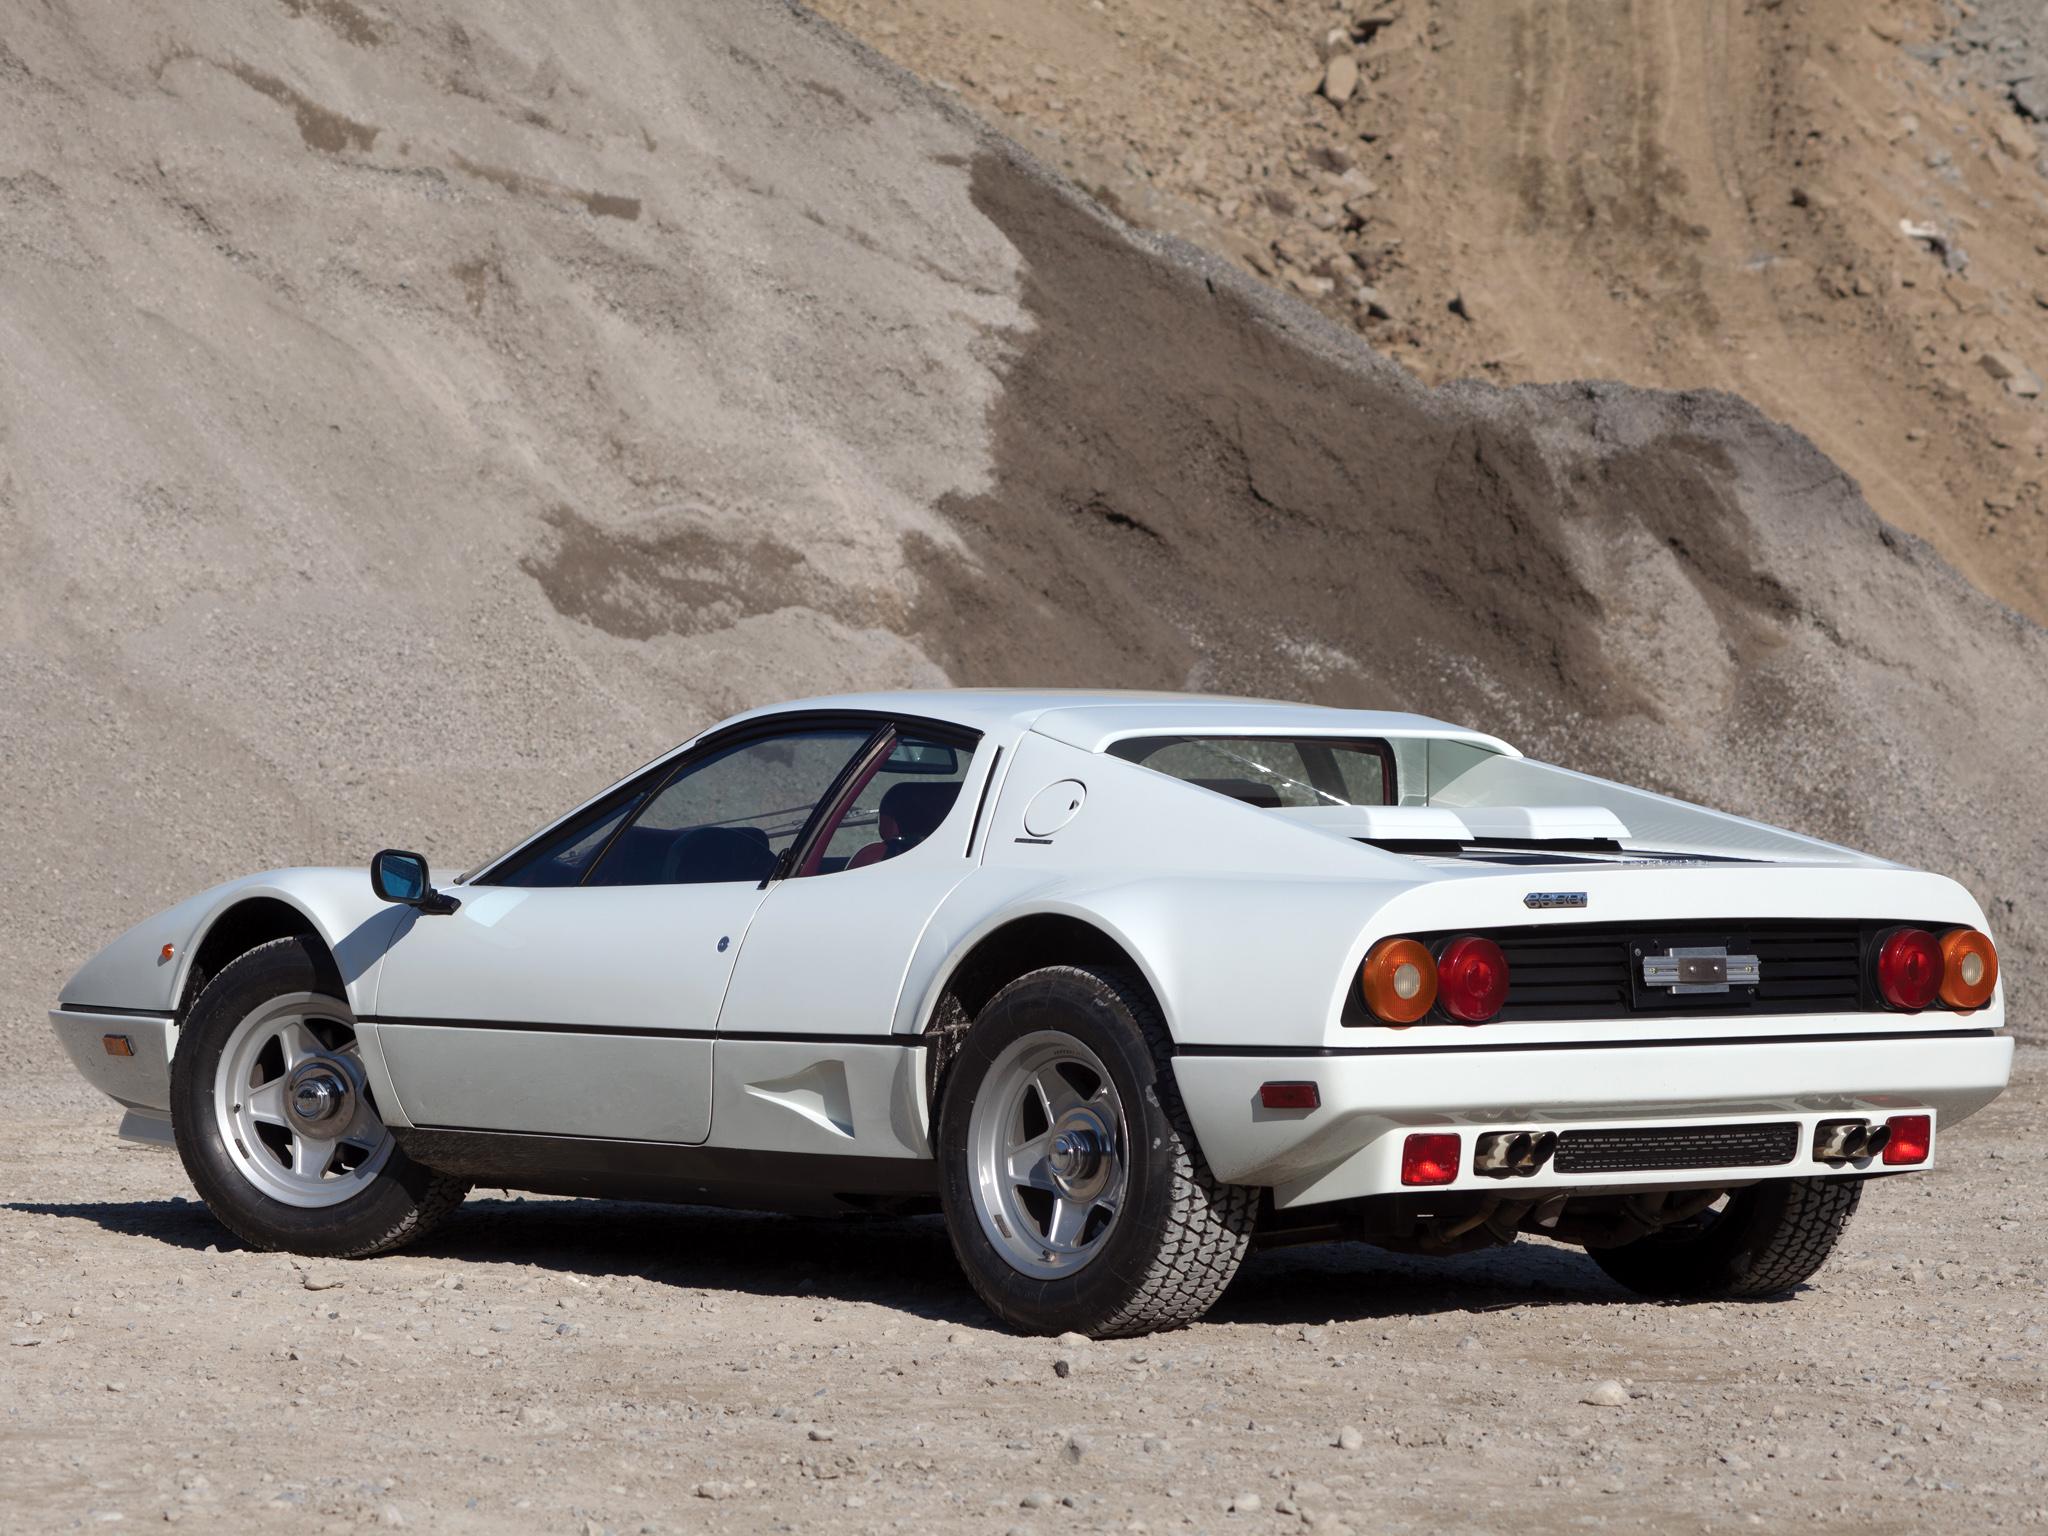 Ferrari-512-BBi-81-84-US-spec-05 Breathtaking Lamborghini Countach Owners Manual Pdf Cars Trend